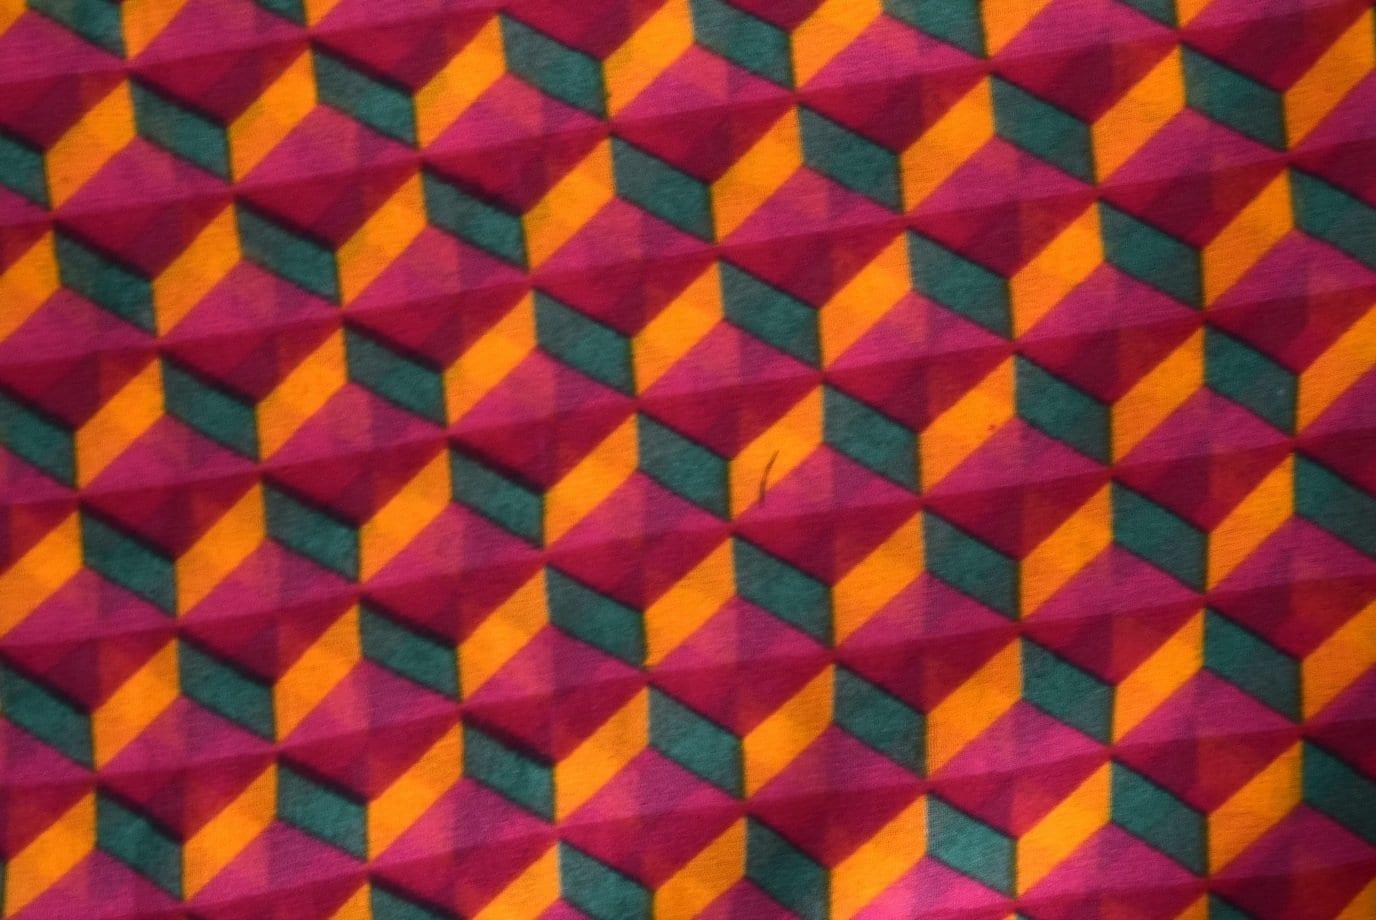 GEORGETTE PRINTED fabric for Kurti, Saree, Salwar, Dupatta GF014 1